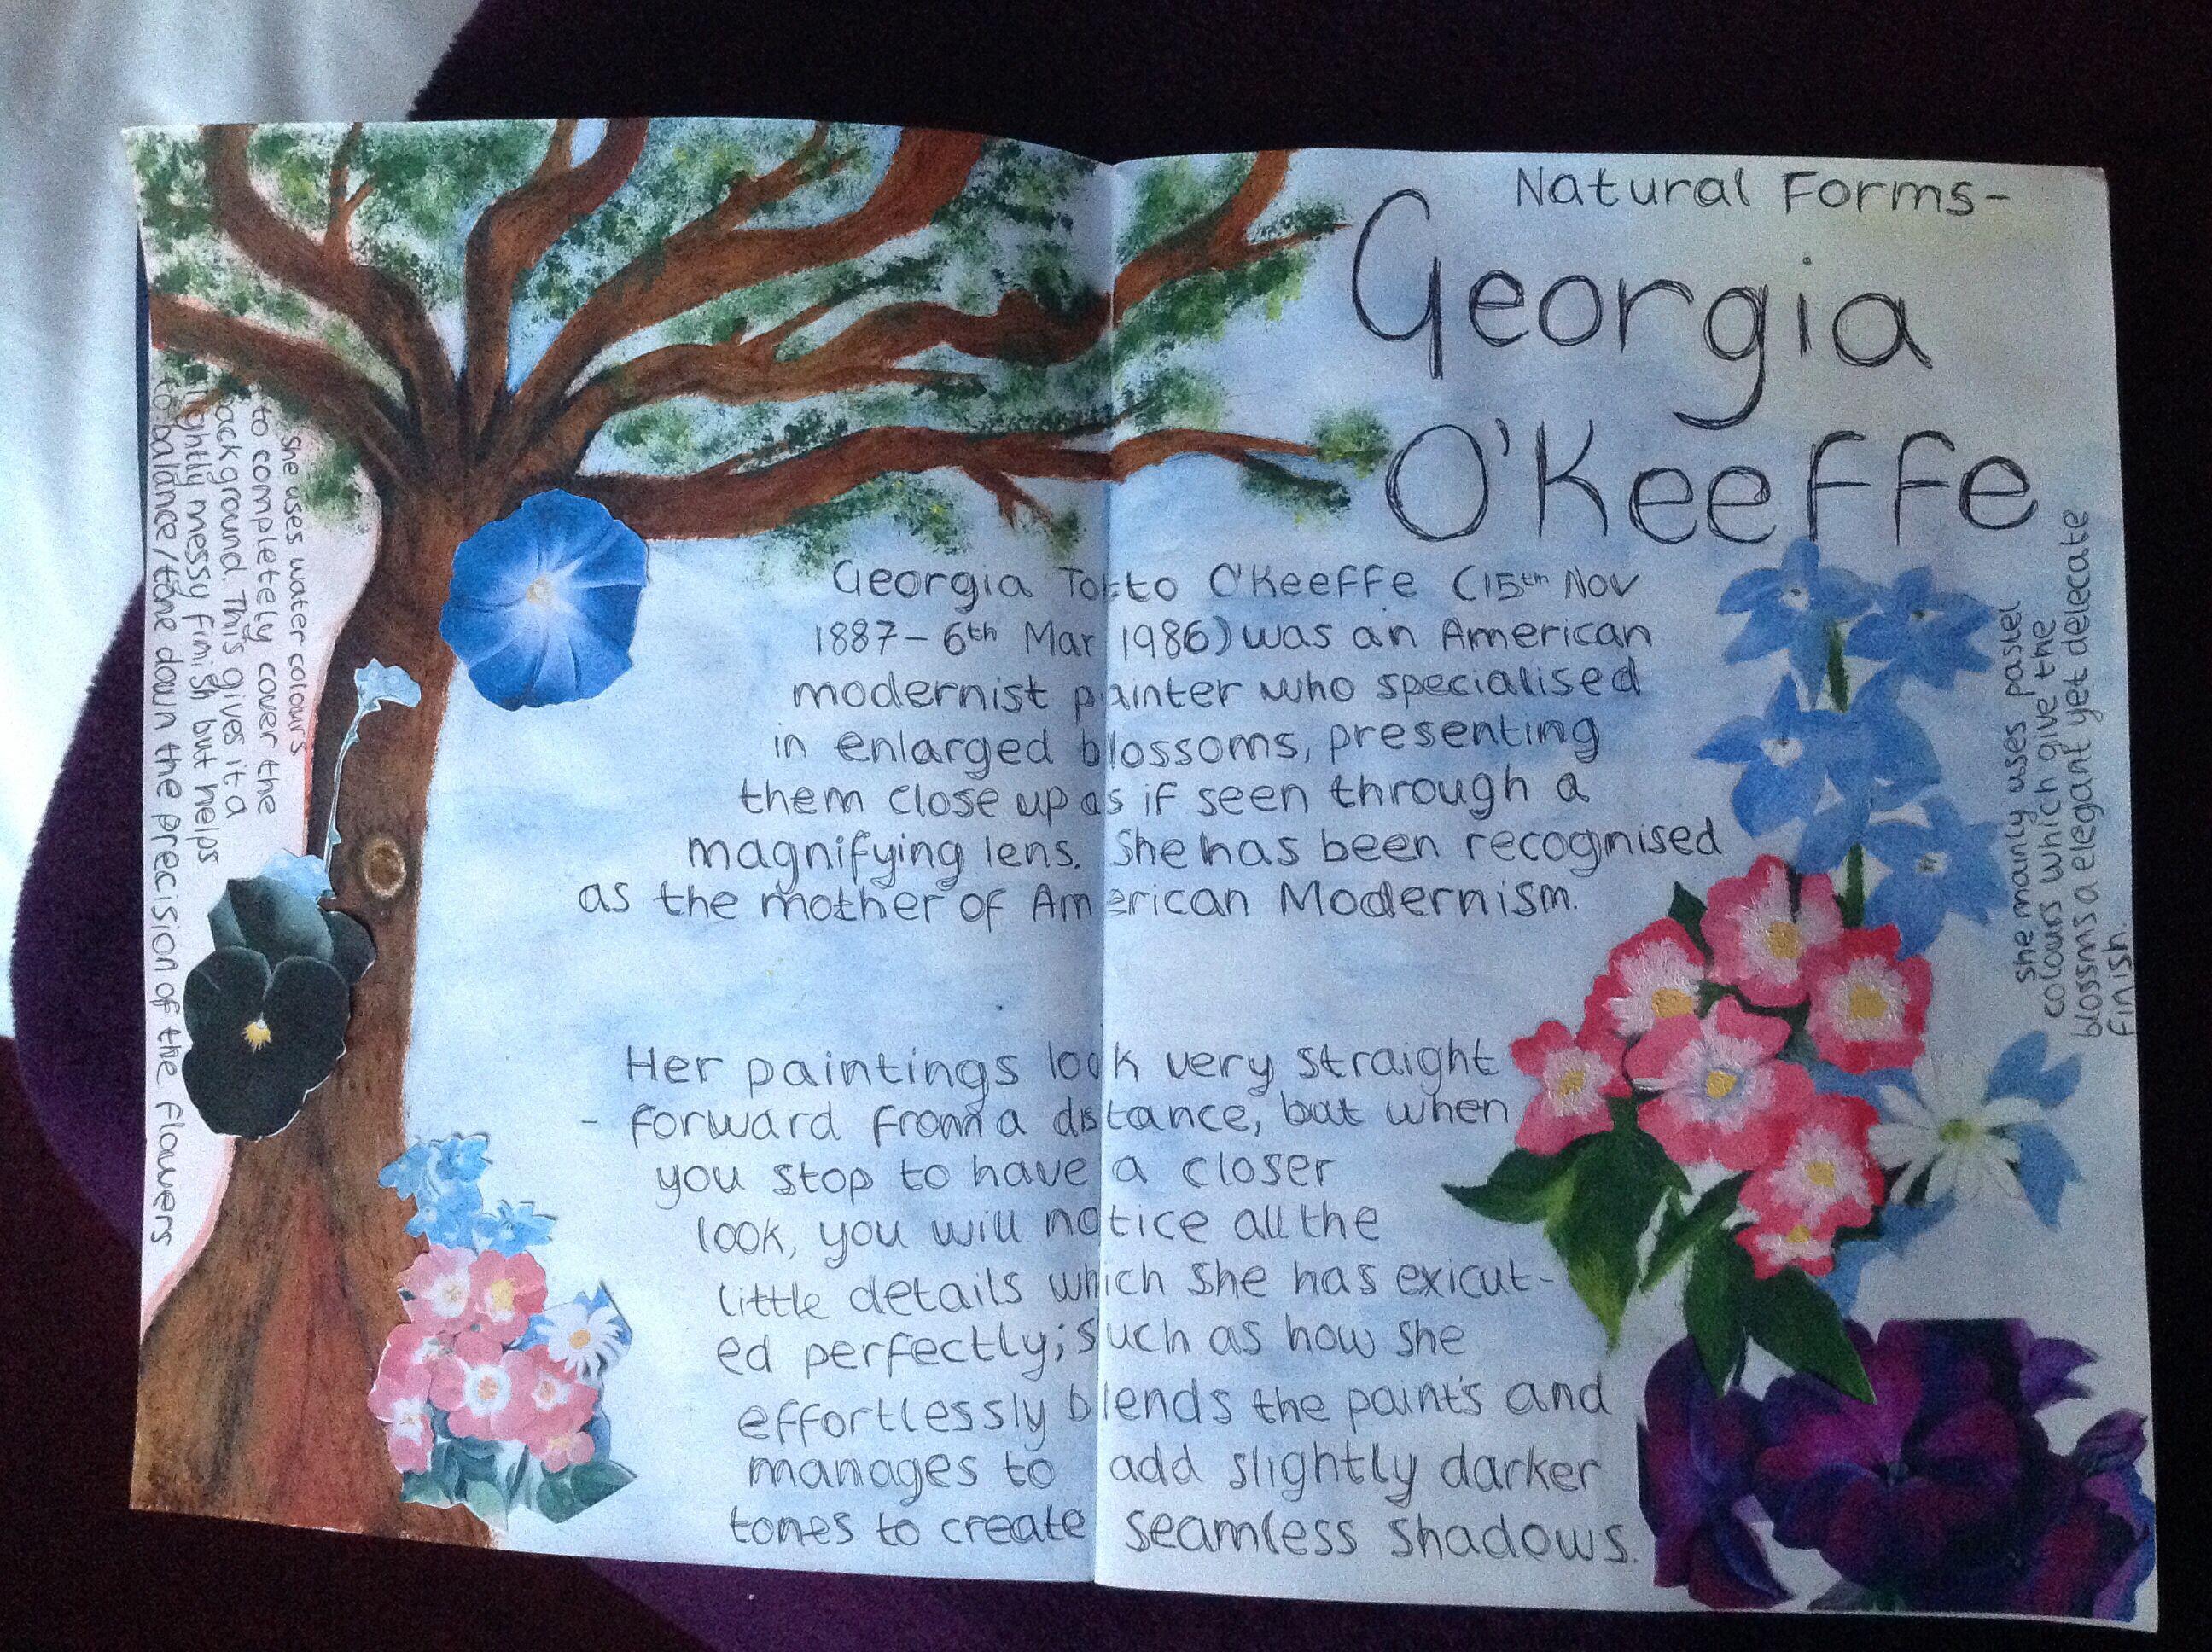 essay georgia okeefe Georgia o'keeffe - part 2 - color essay example georgia o' keeffe is a famous female artist from the early 1900's.